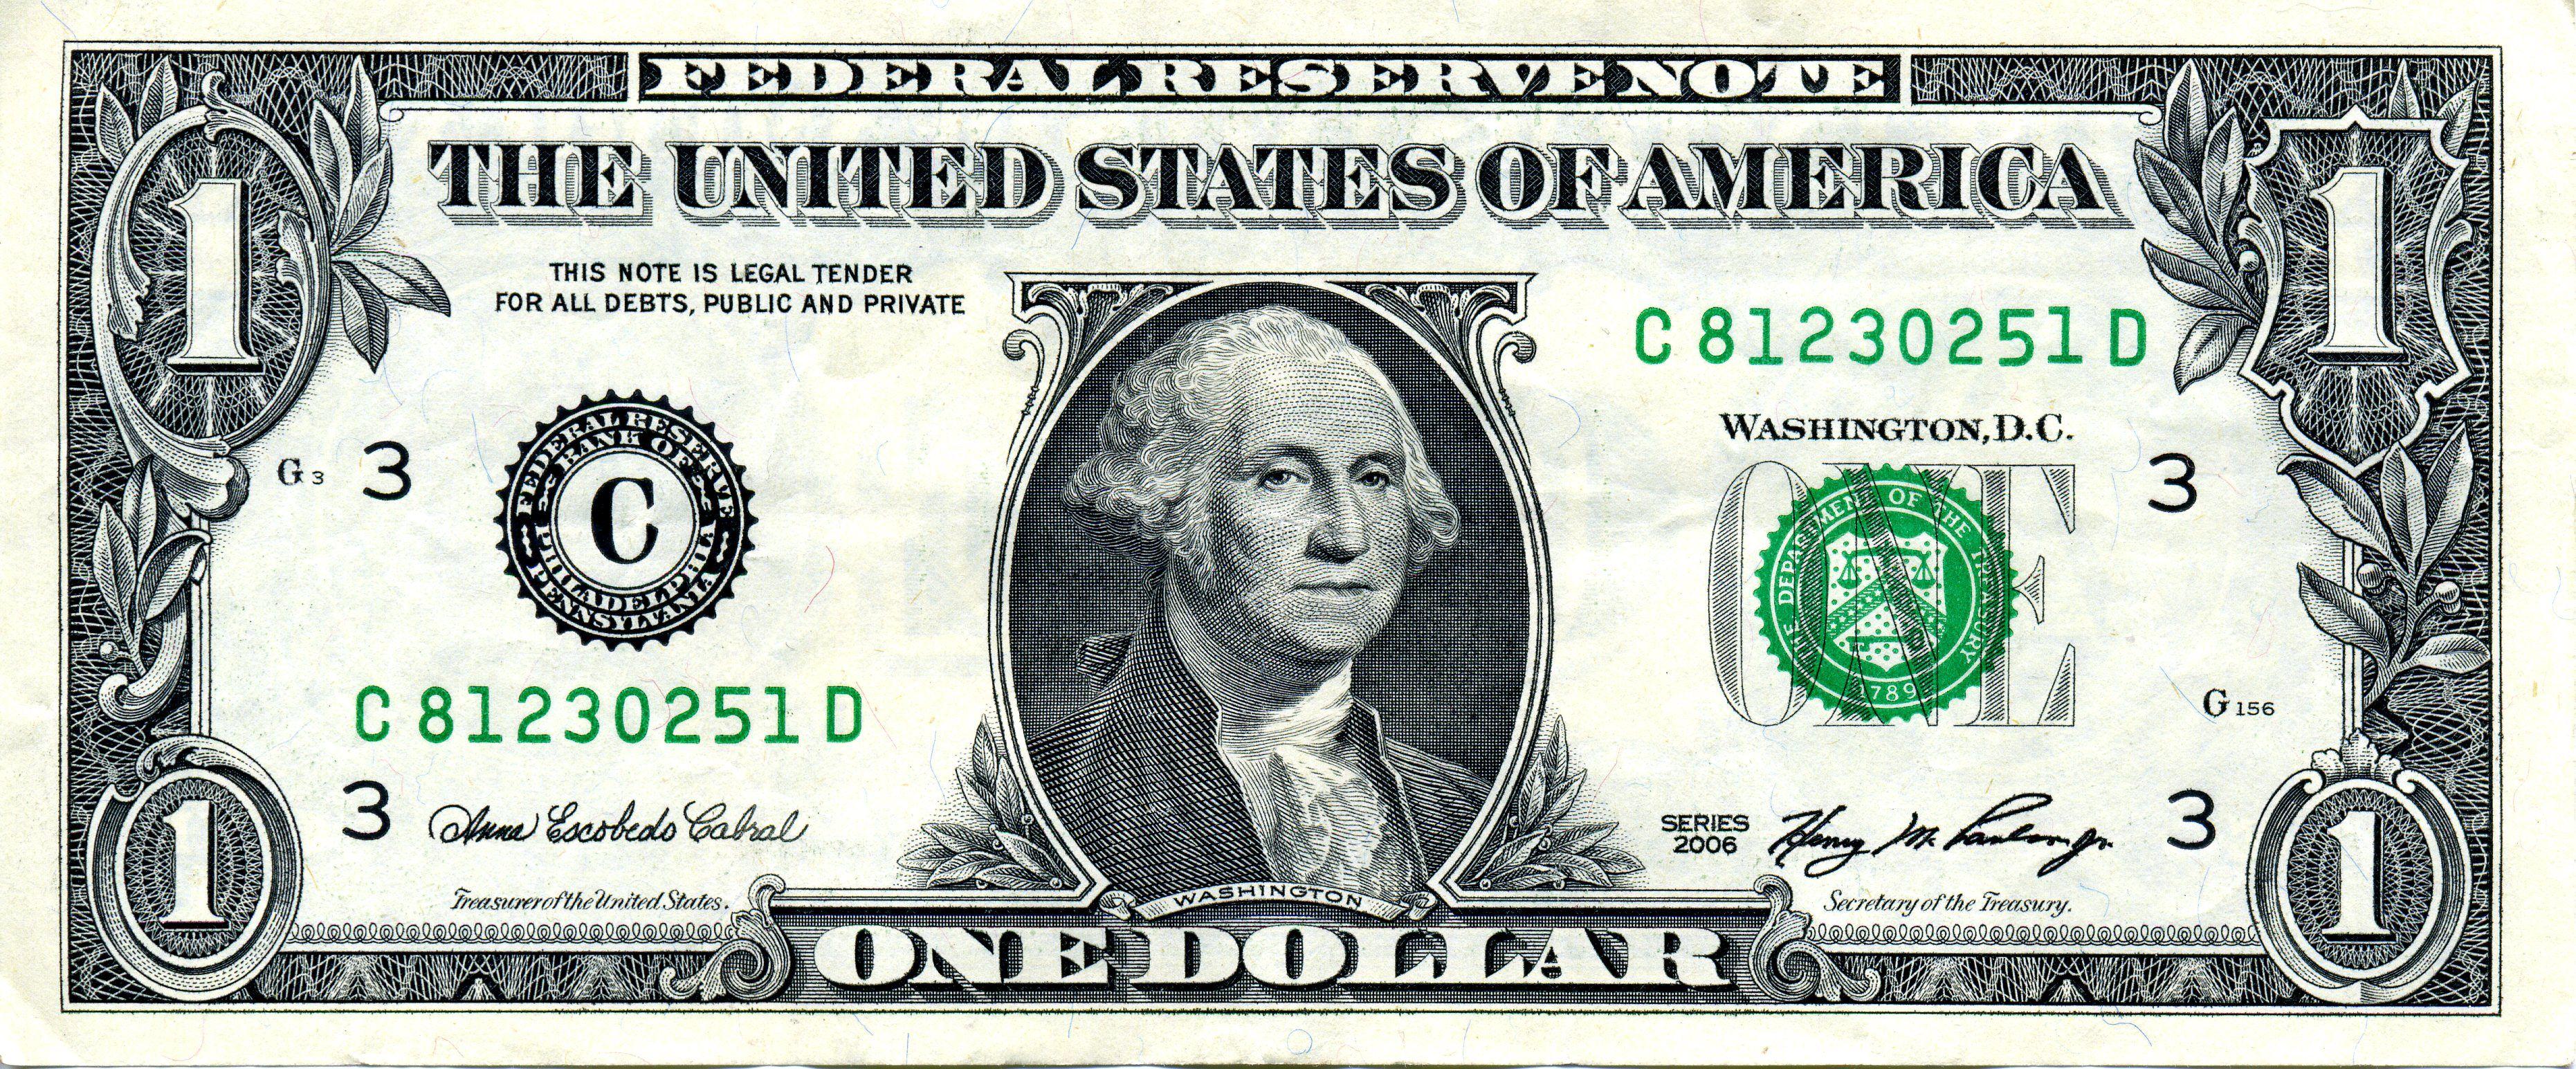 Free Photo 1 Dollar Bills American Group Wages Free Download Jooinn